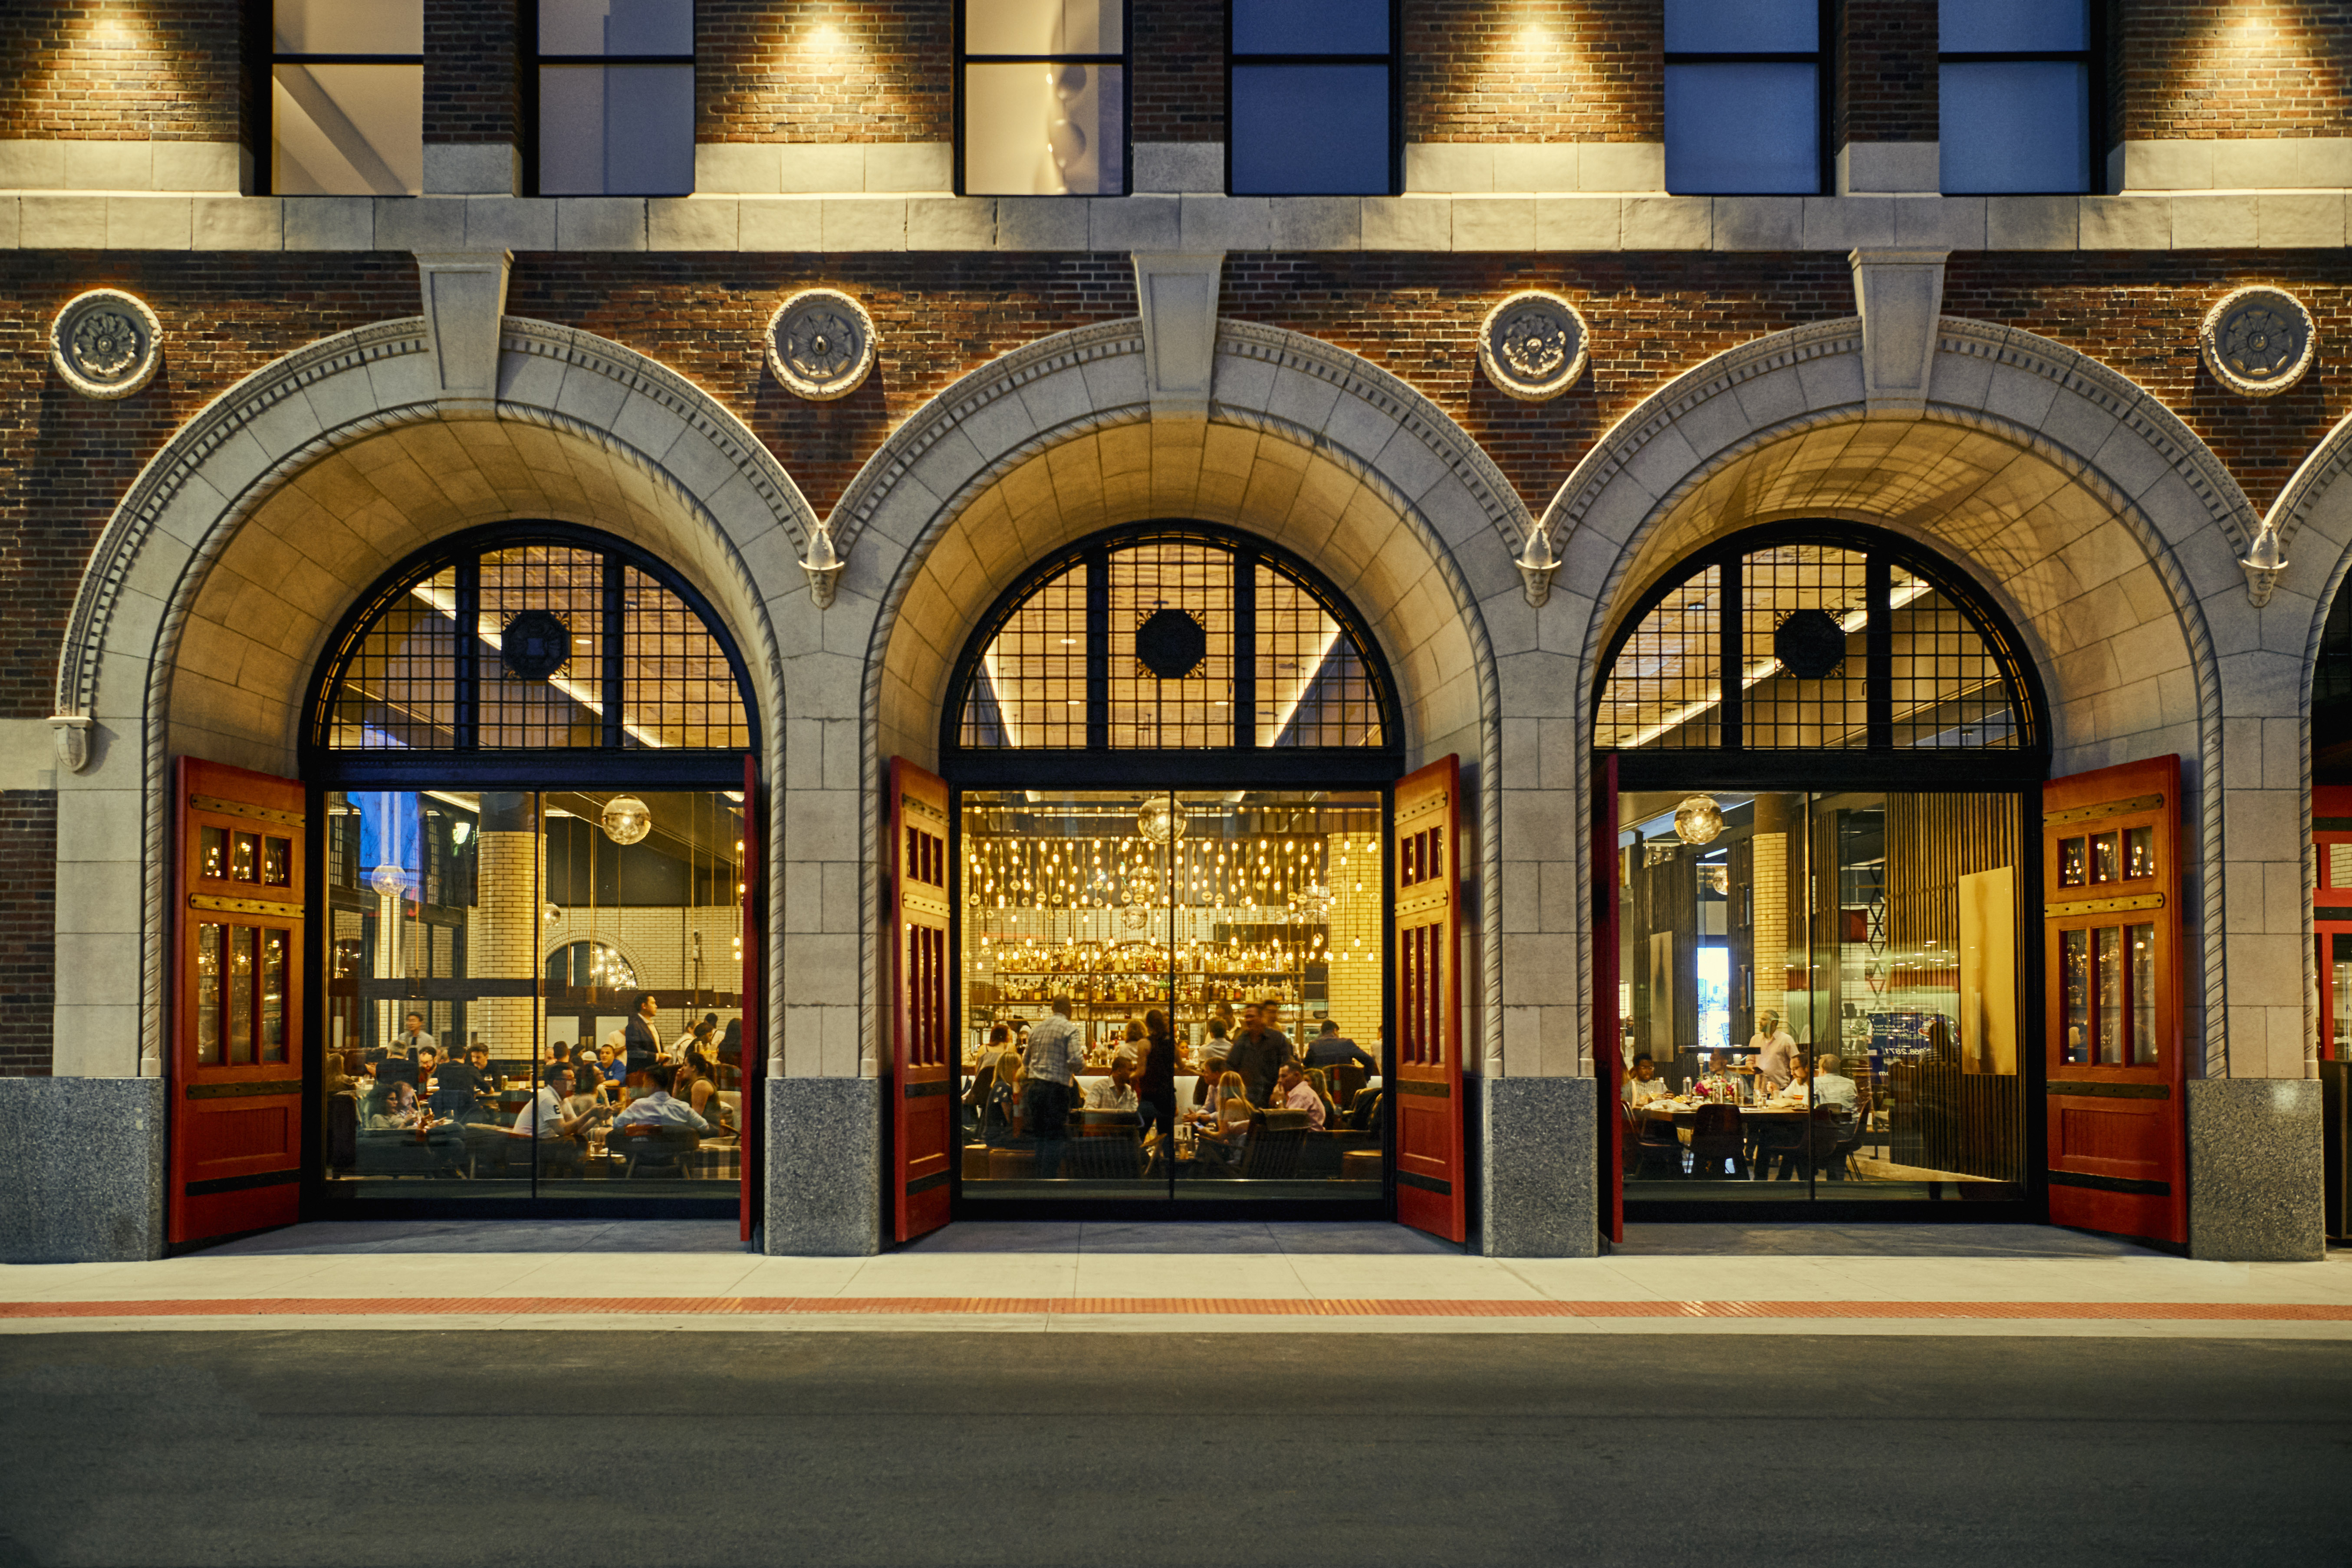 Detroit Foundation Hotel (DFH), with Lighting Design by Illuminart, Wins IES 'Illumination Award of Merit,' Marking its 8th Award